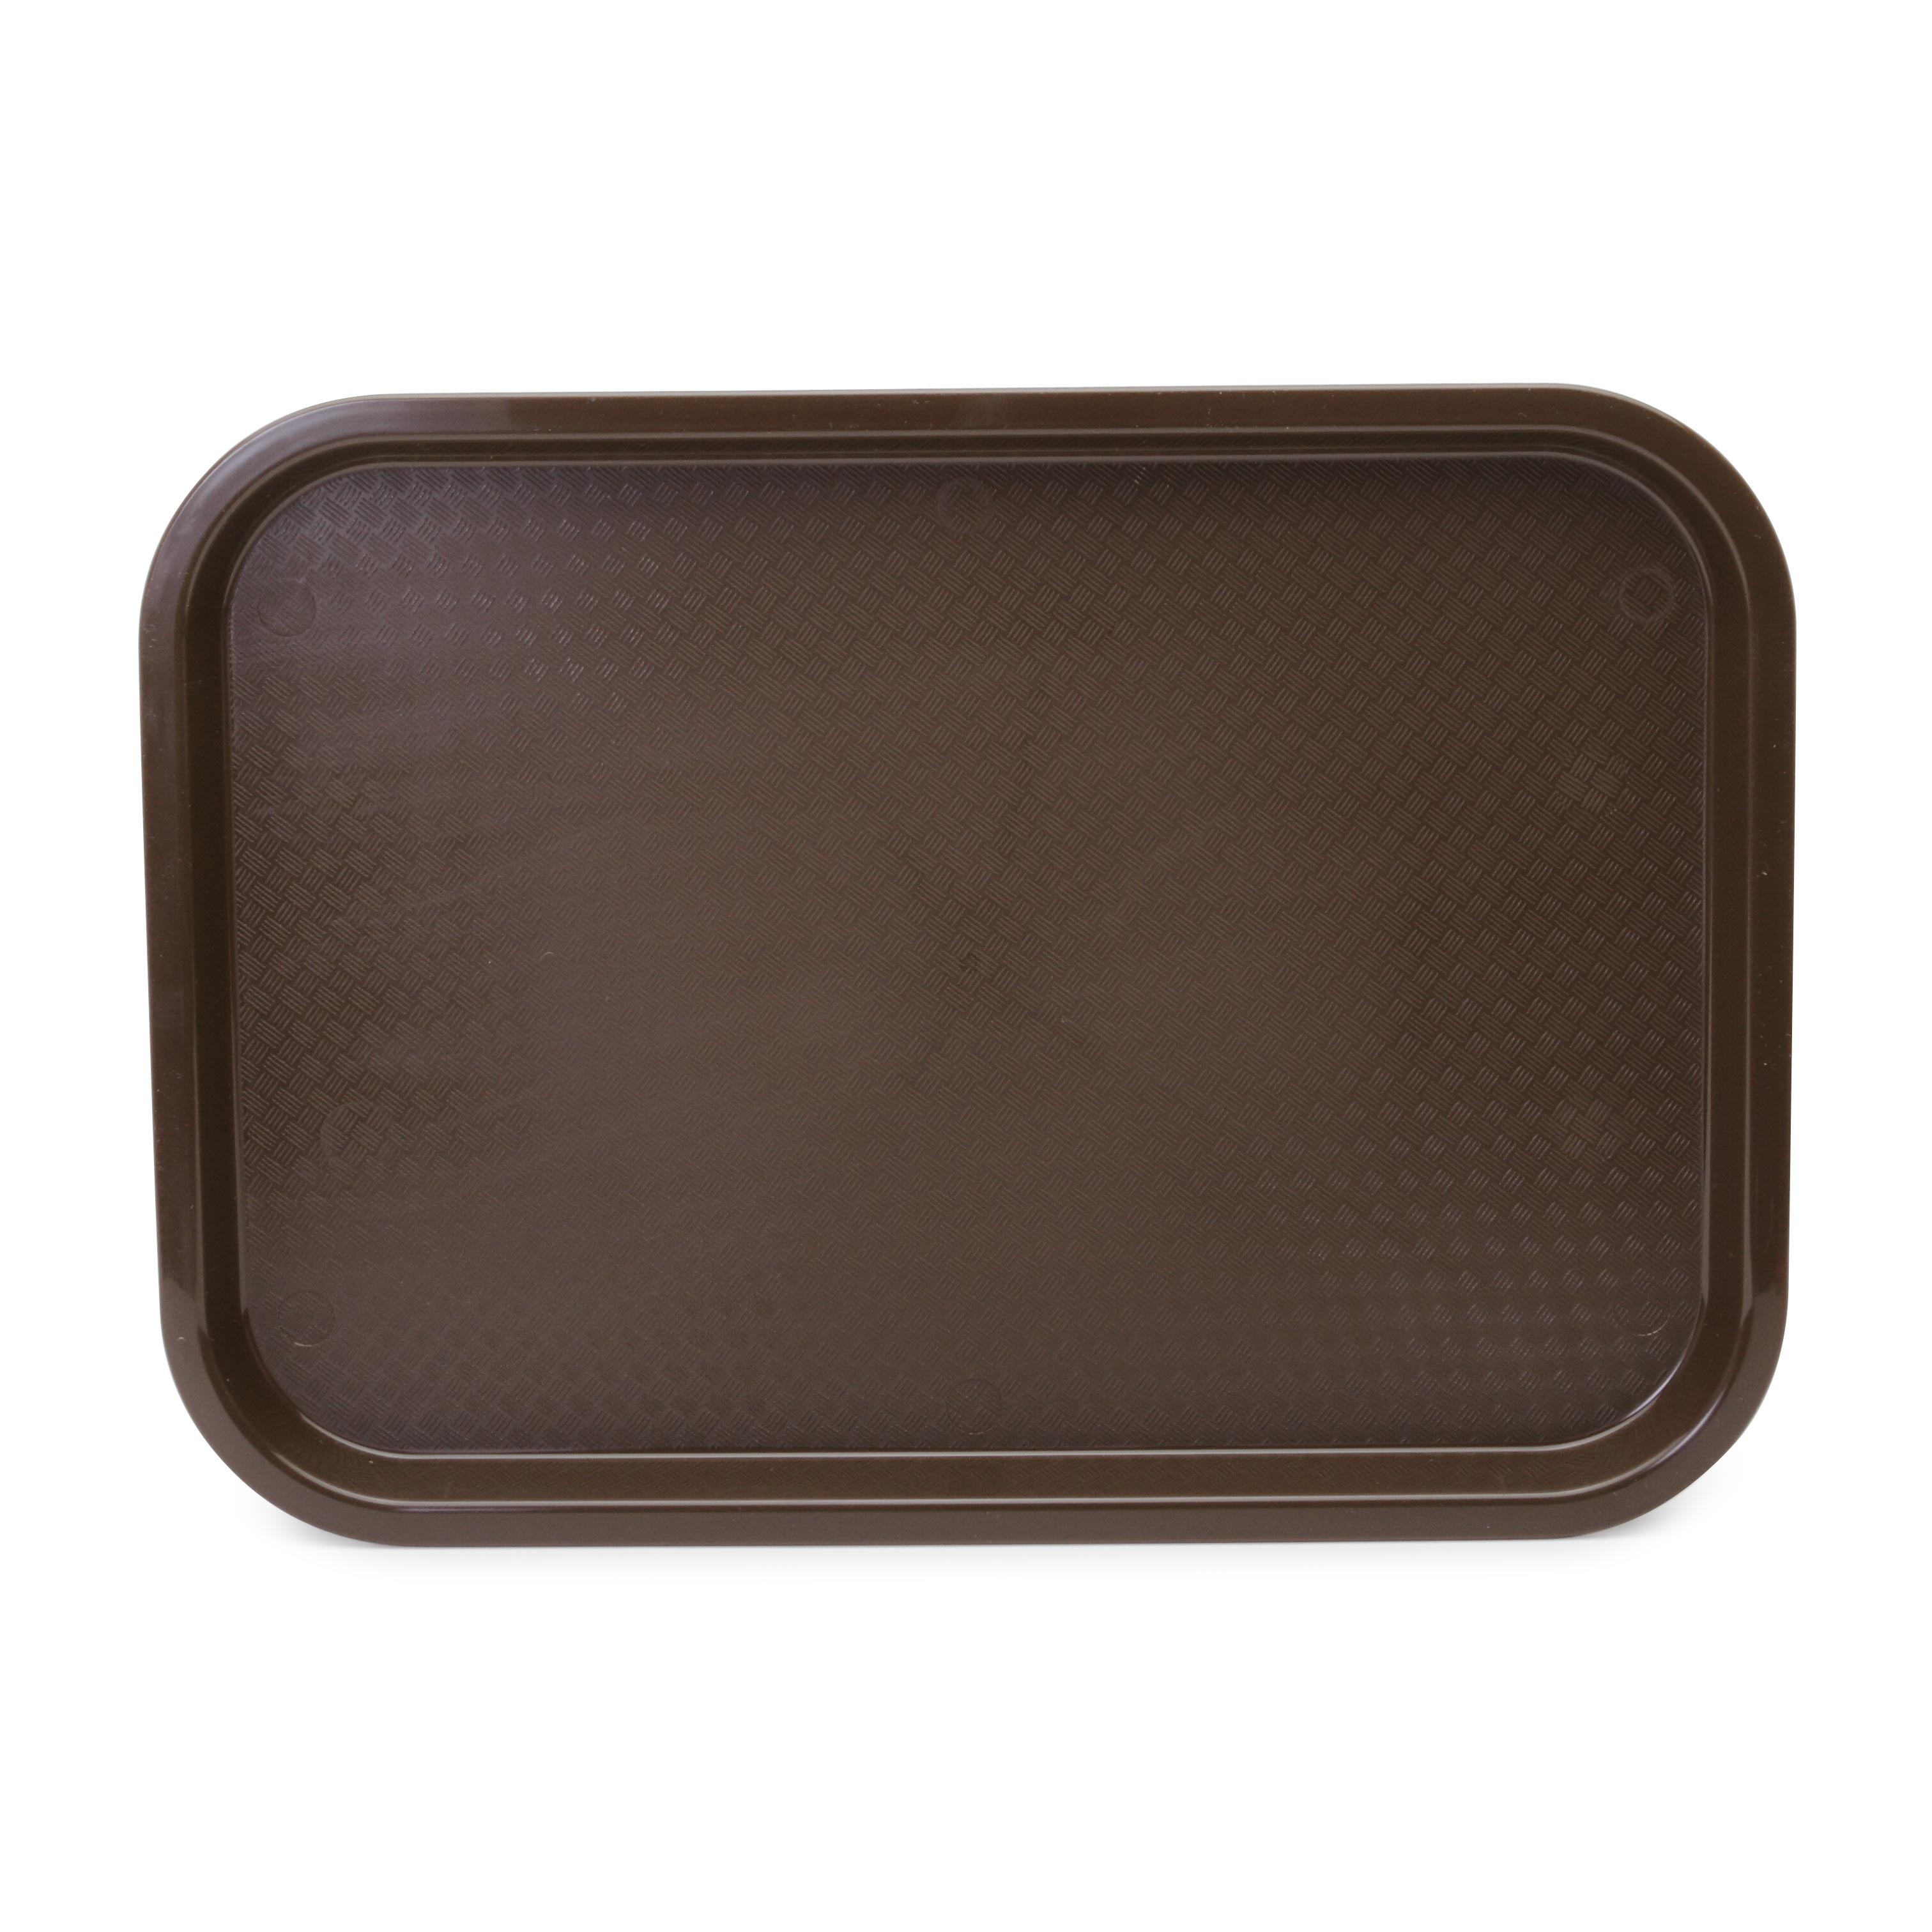 Royal Industries DIN TC101406 tray, fast food